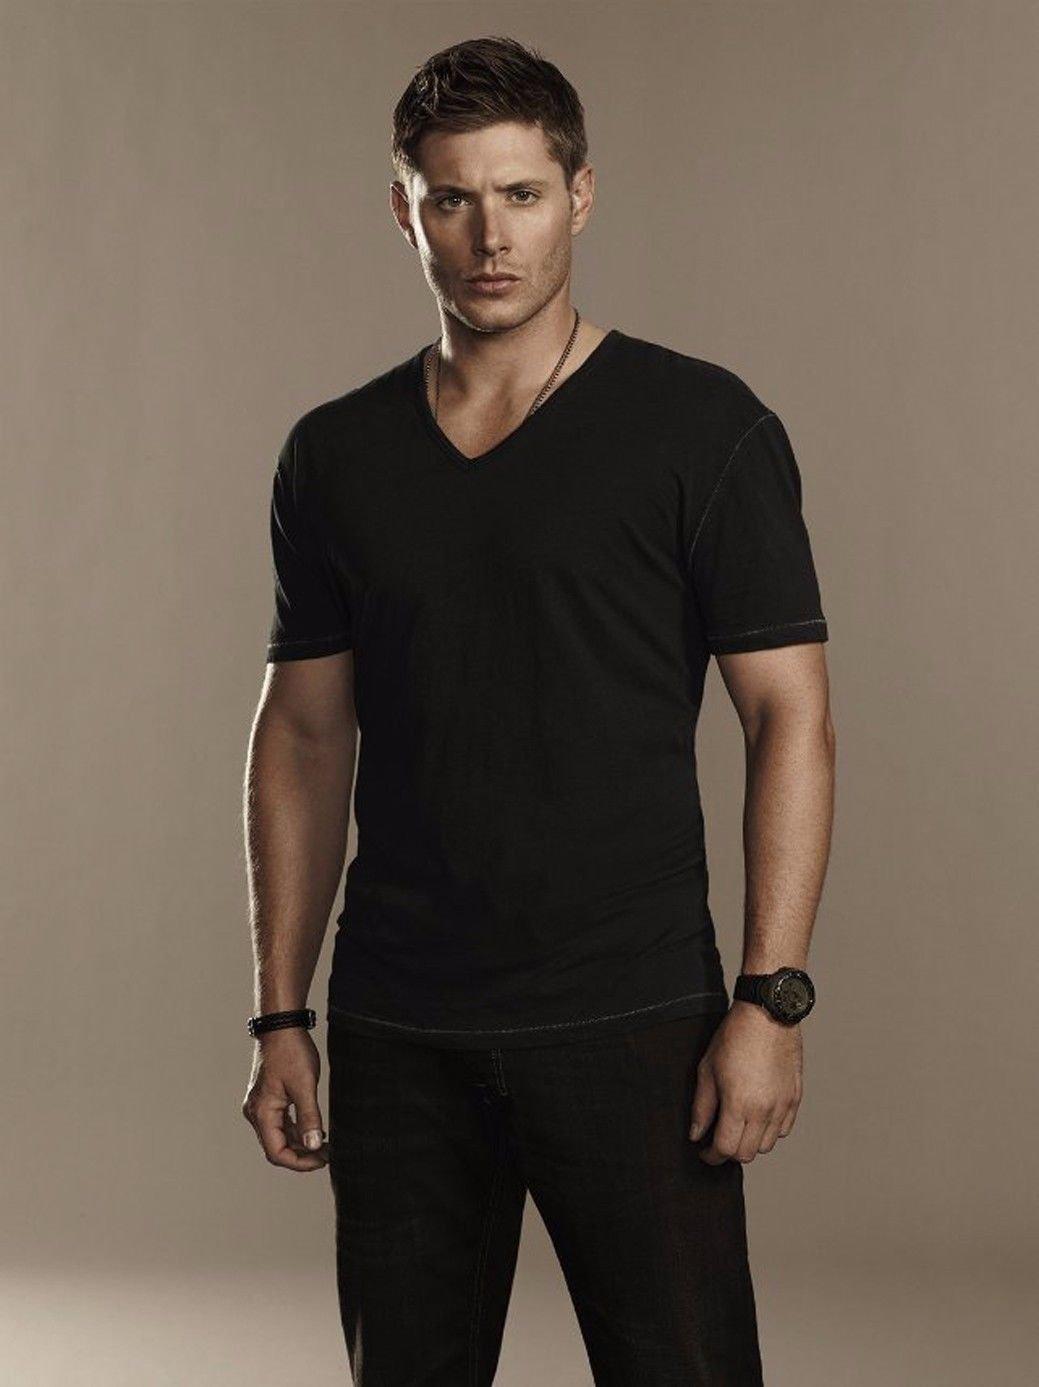 Jensen Ackles Actor Star Art 32x24 Poster Decor